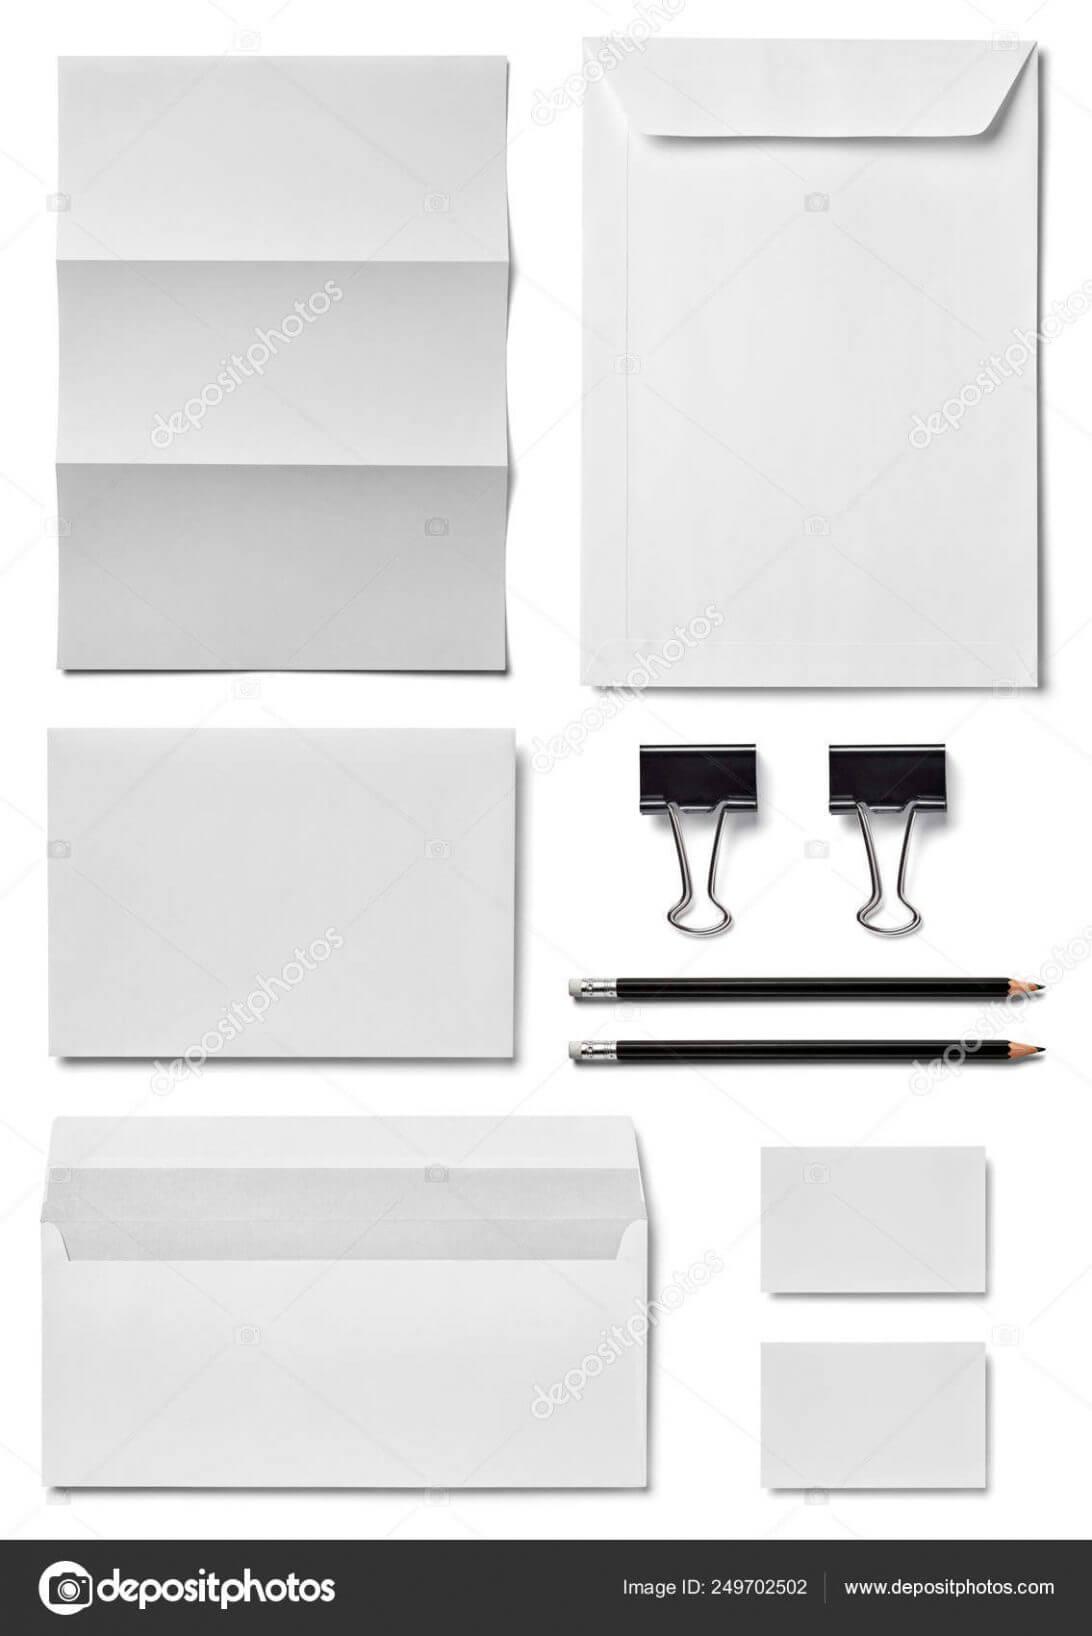 Business Envelope Template Design Illustrator Microsoft Word Within Business Envelope Template Illustrator